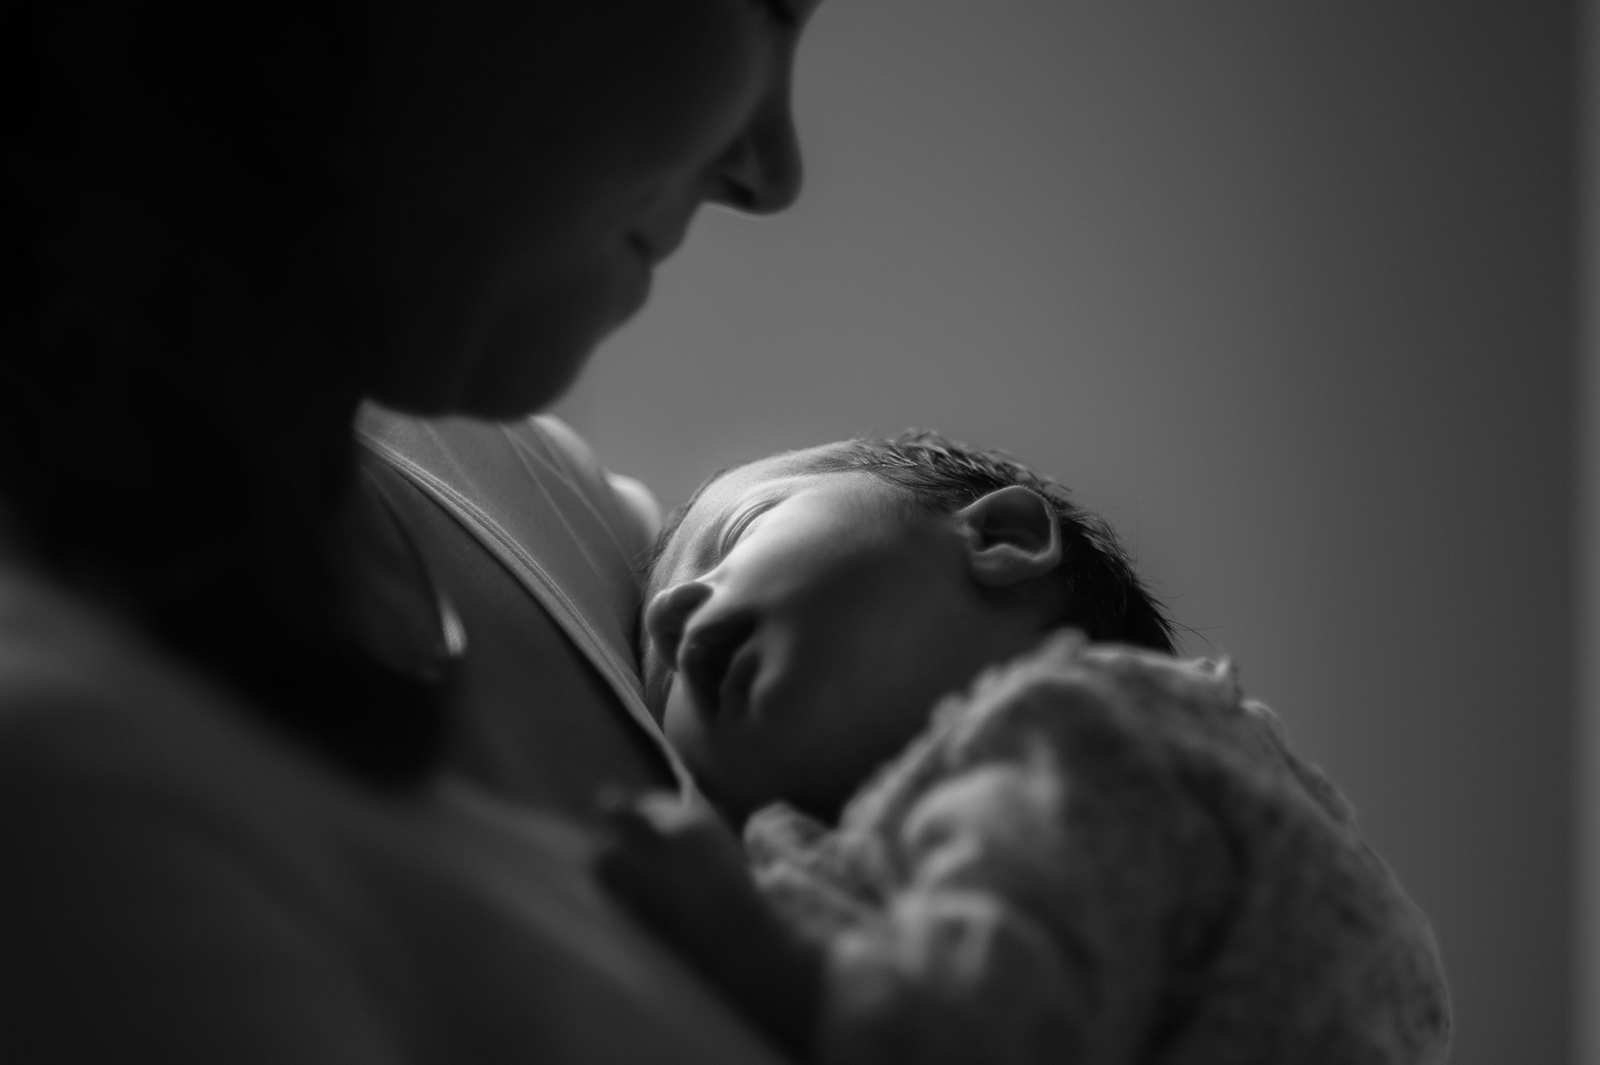 seance-photo-famille-photo-grossesse-photo-bébé-naissance-sabrina-godemert-photographe-seine-et-marne034